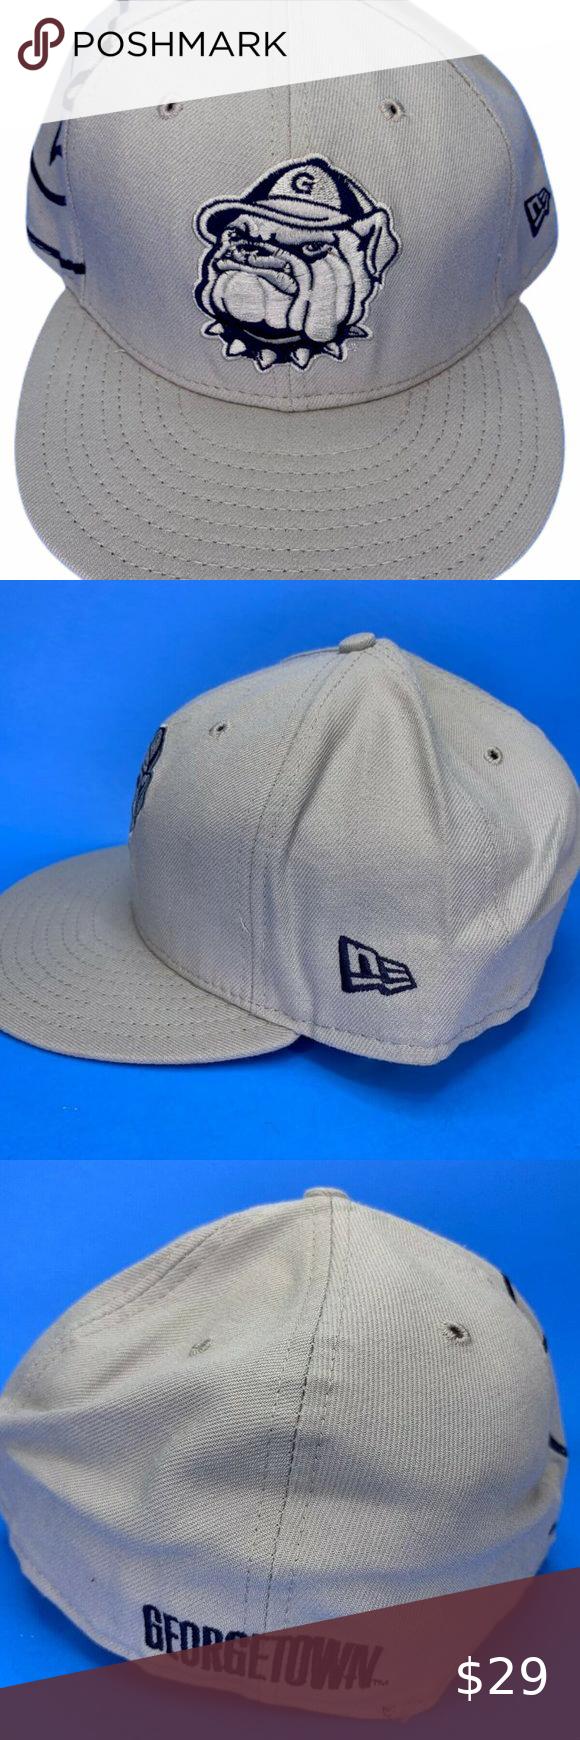 Ncaa Georgetown New Era Hat Size 7 3 4 Ncaa Georgetown New Era Hat Size 7 3 4 All Colors Bright Vibrant I Will Ship This Item O New Era Hat New Era Hat Sizes